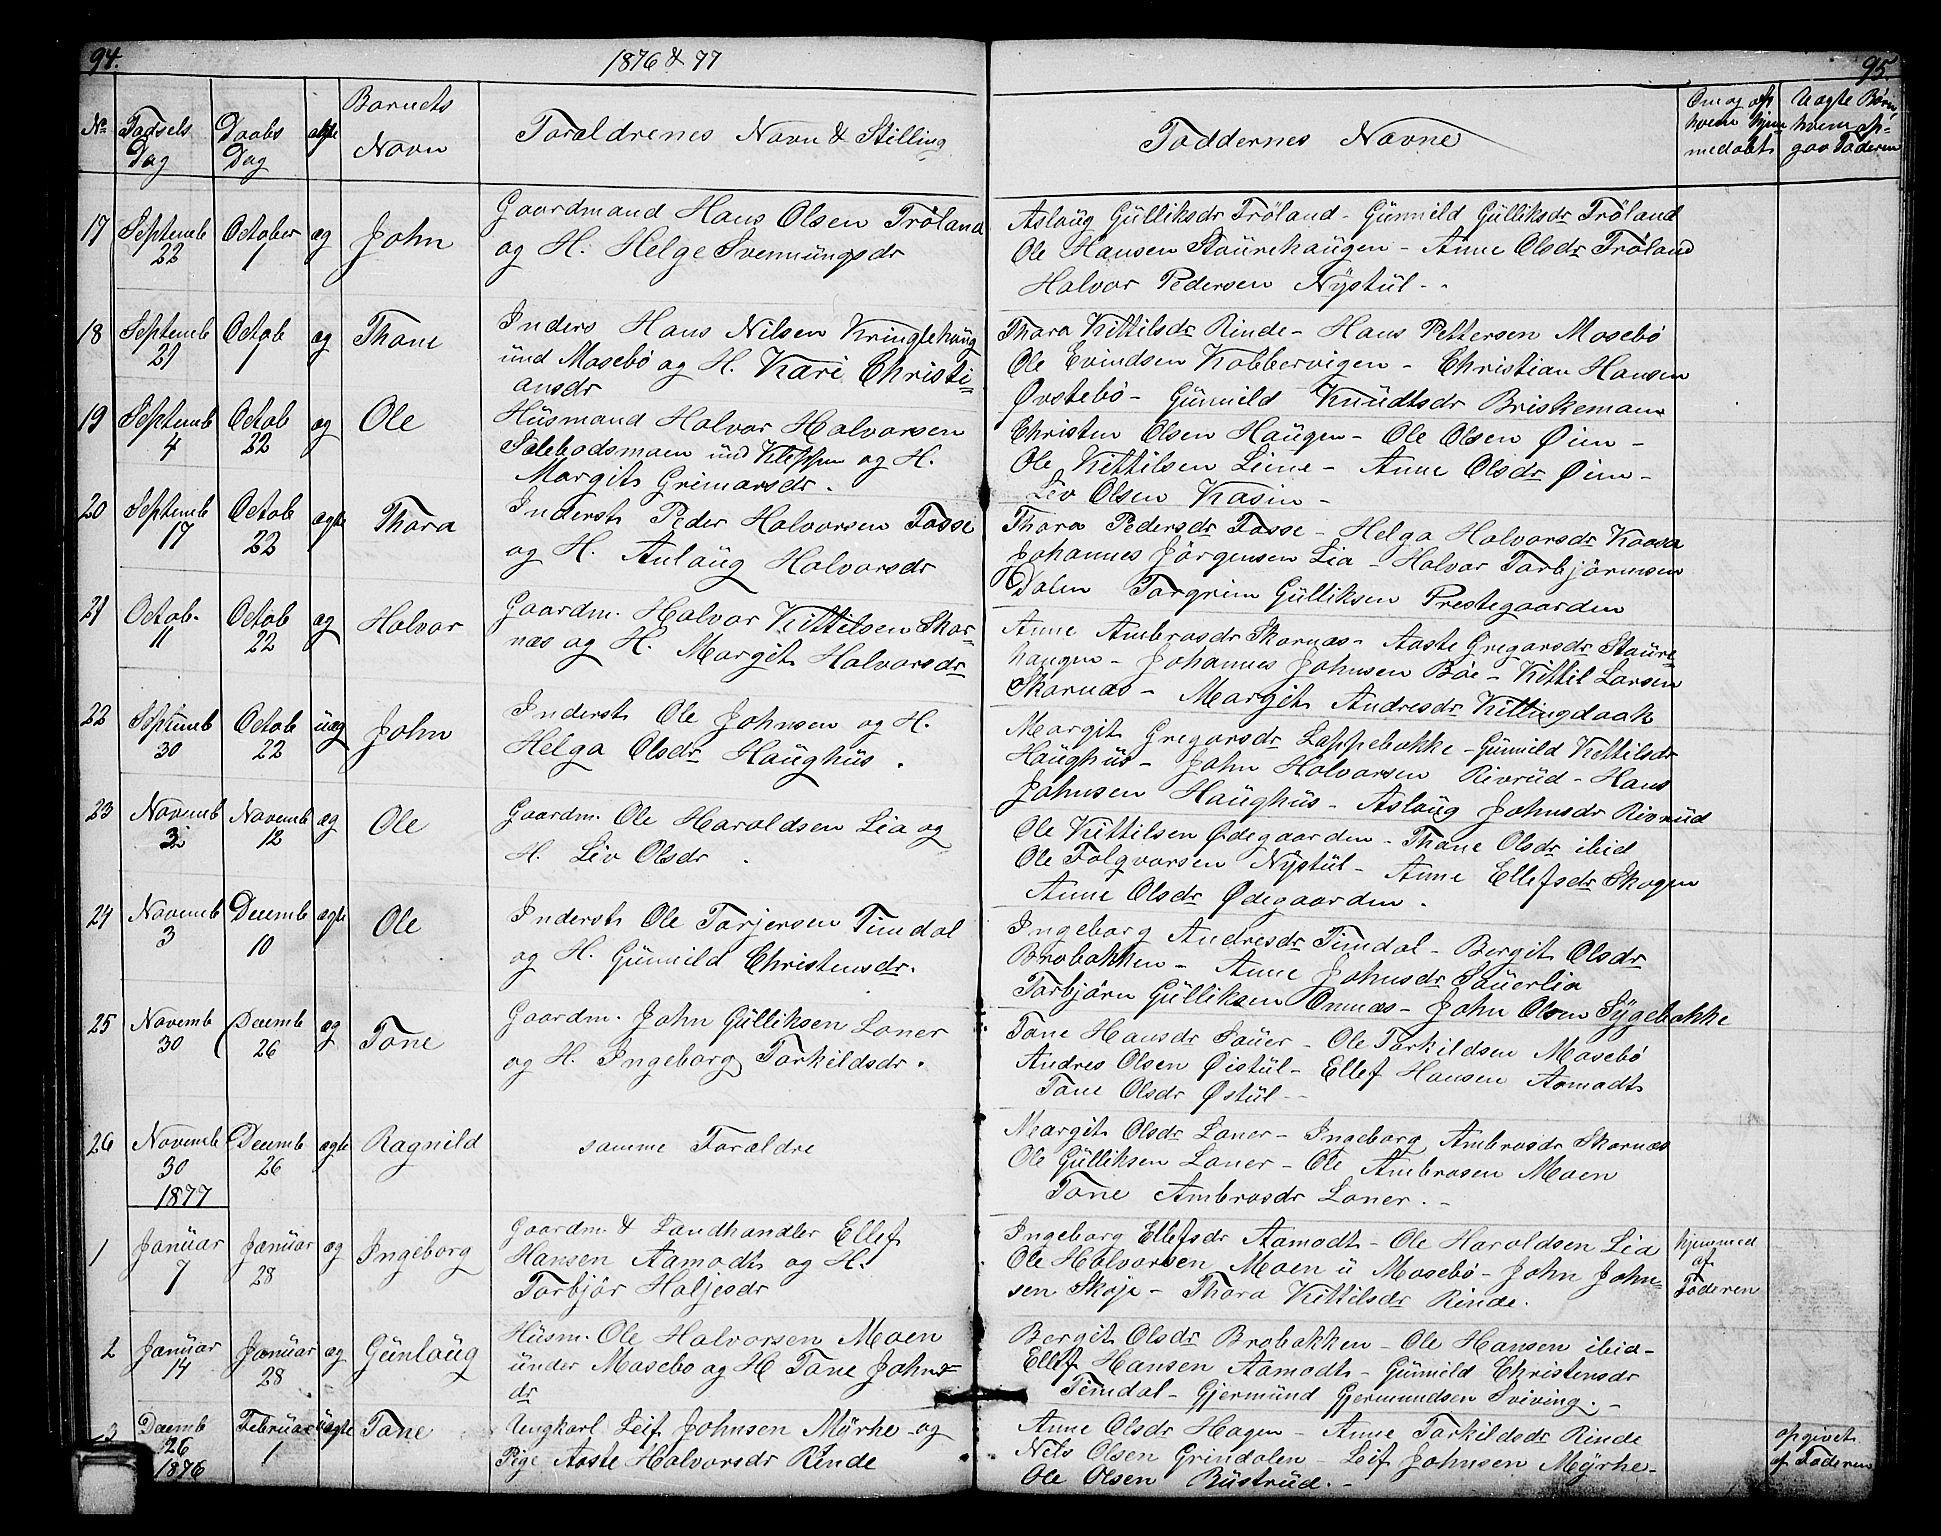 SAKO, Hjartdal kirkebøker, G/Gb/L0002: Klokkerbok nr. II 2, 1854-1884, s. 94-95